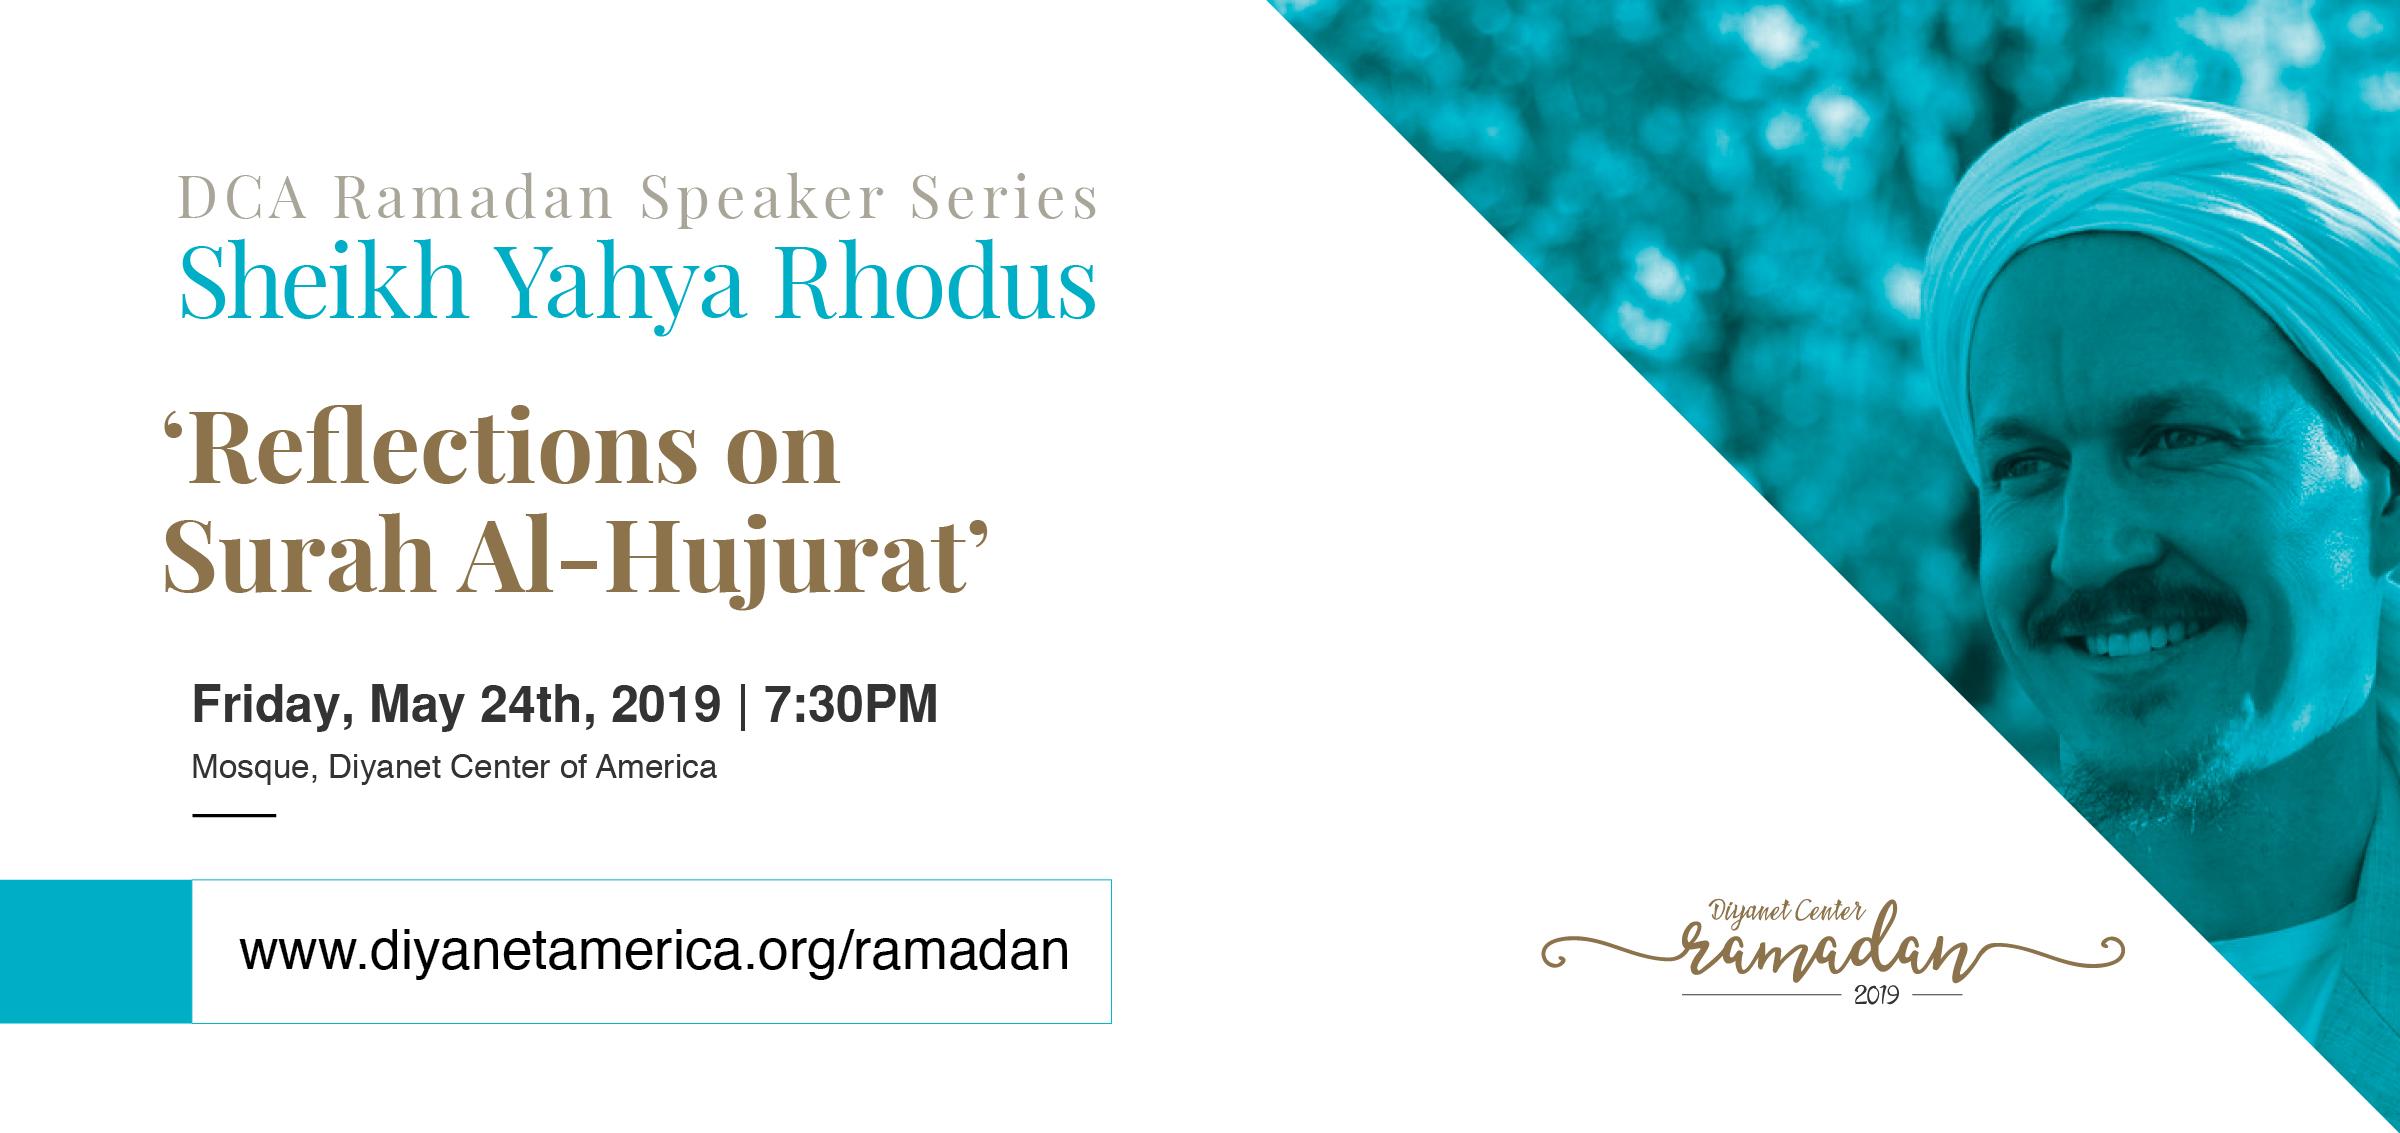 Reflections on Surah Al-Hujurat with Yahya Rhodus